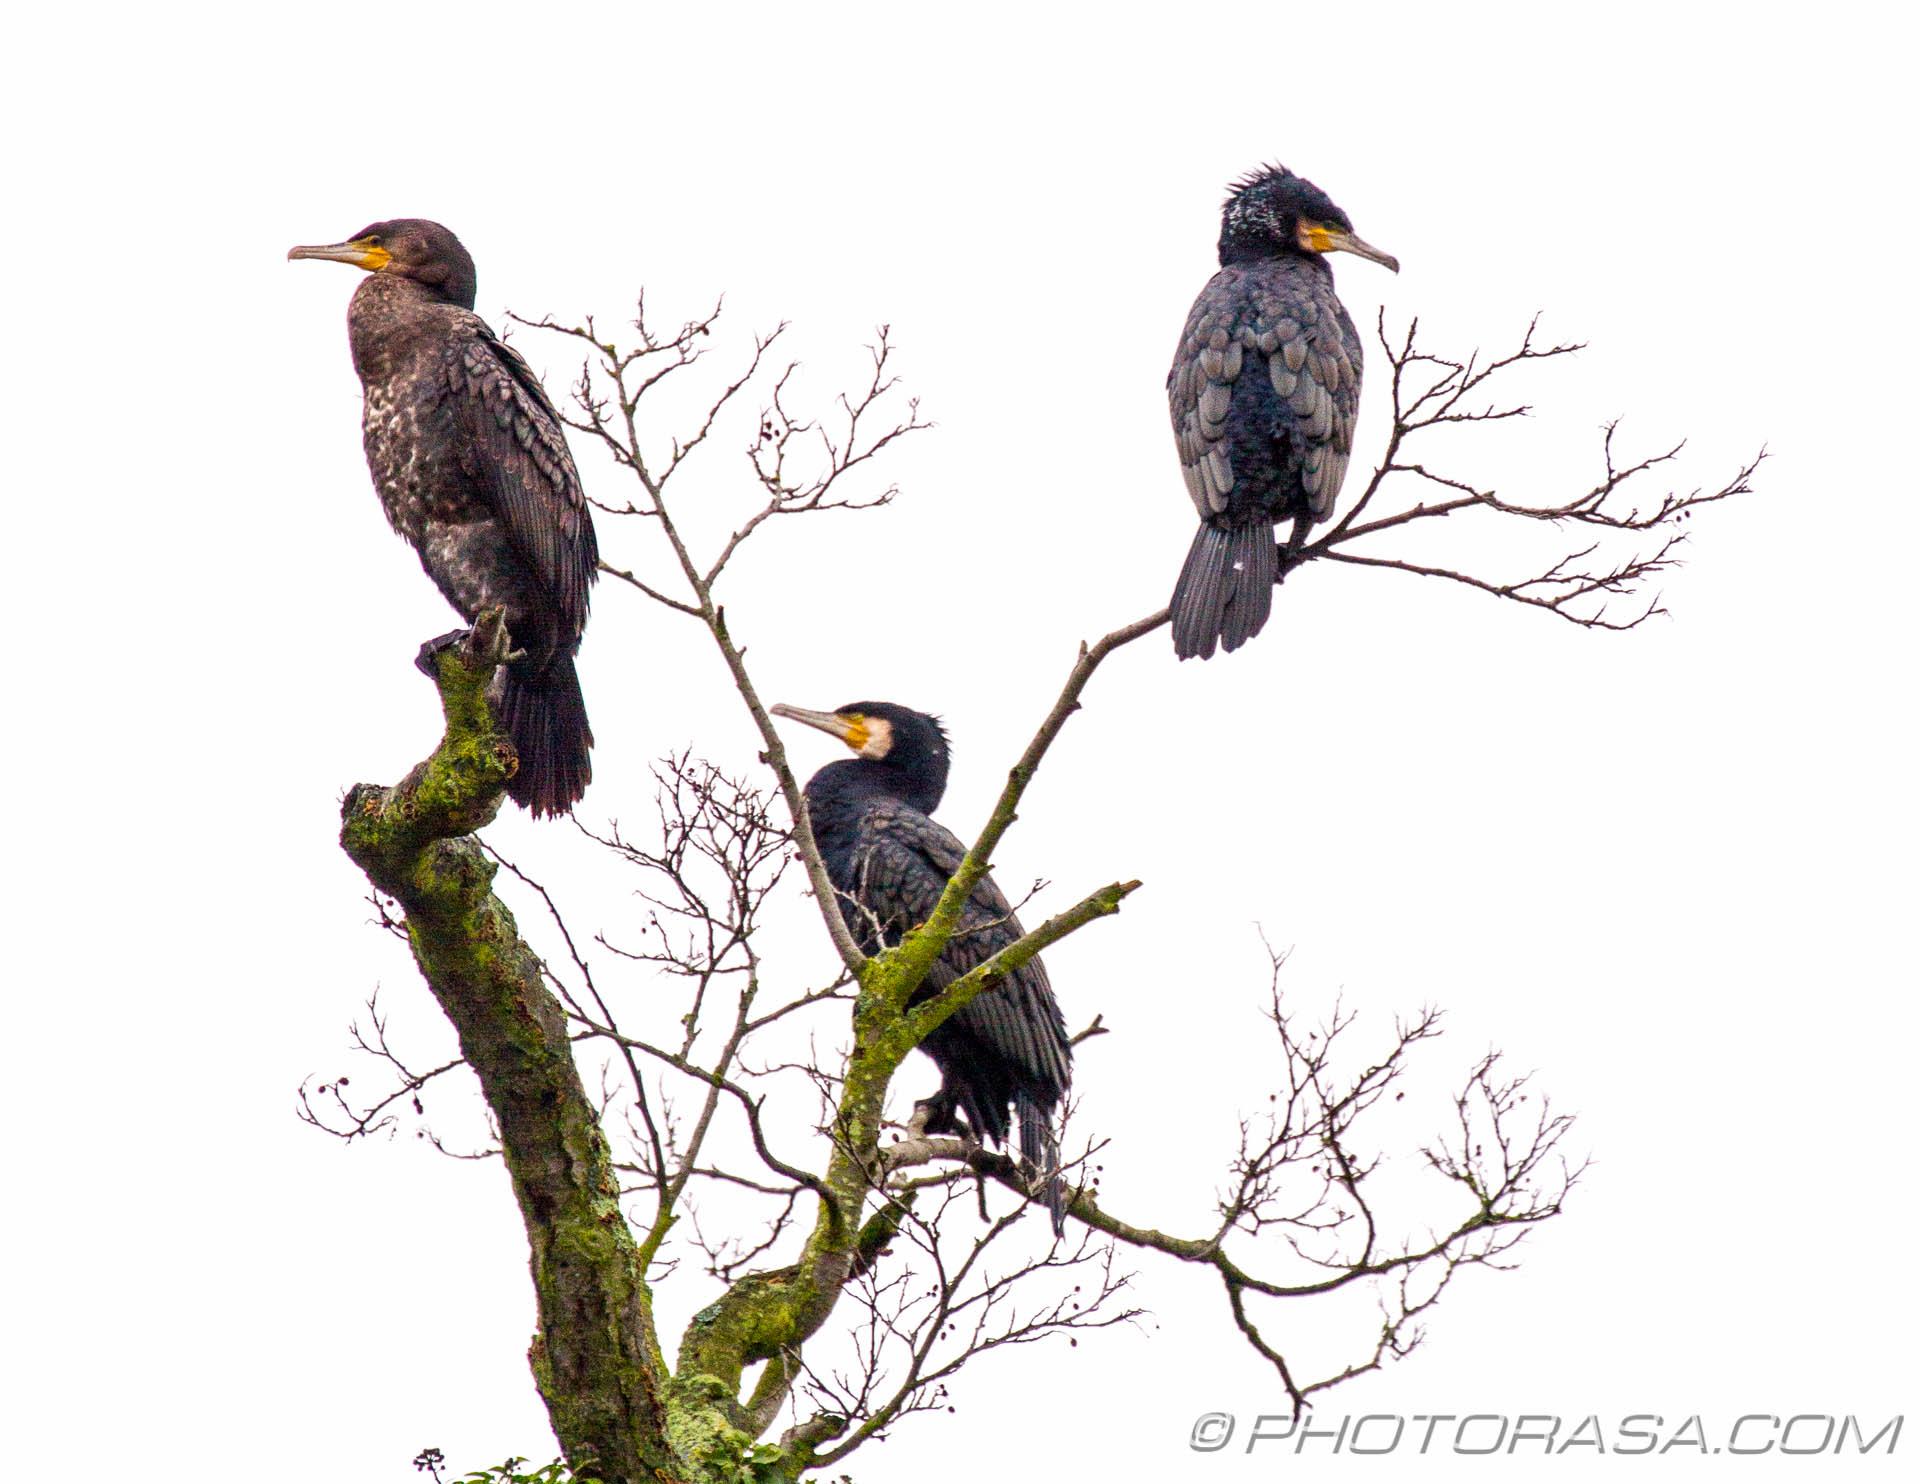 http://photorasa.com/three-cormorants/three-cormorants-sitting-in-a-tree/